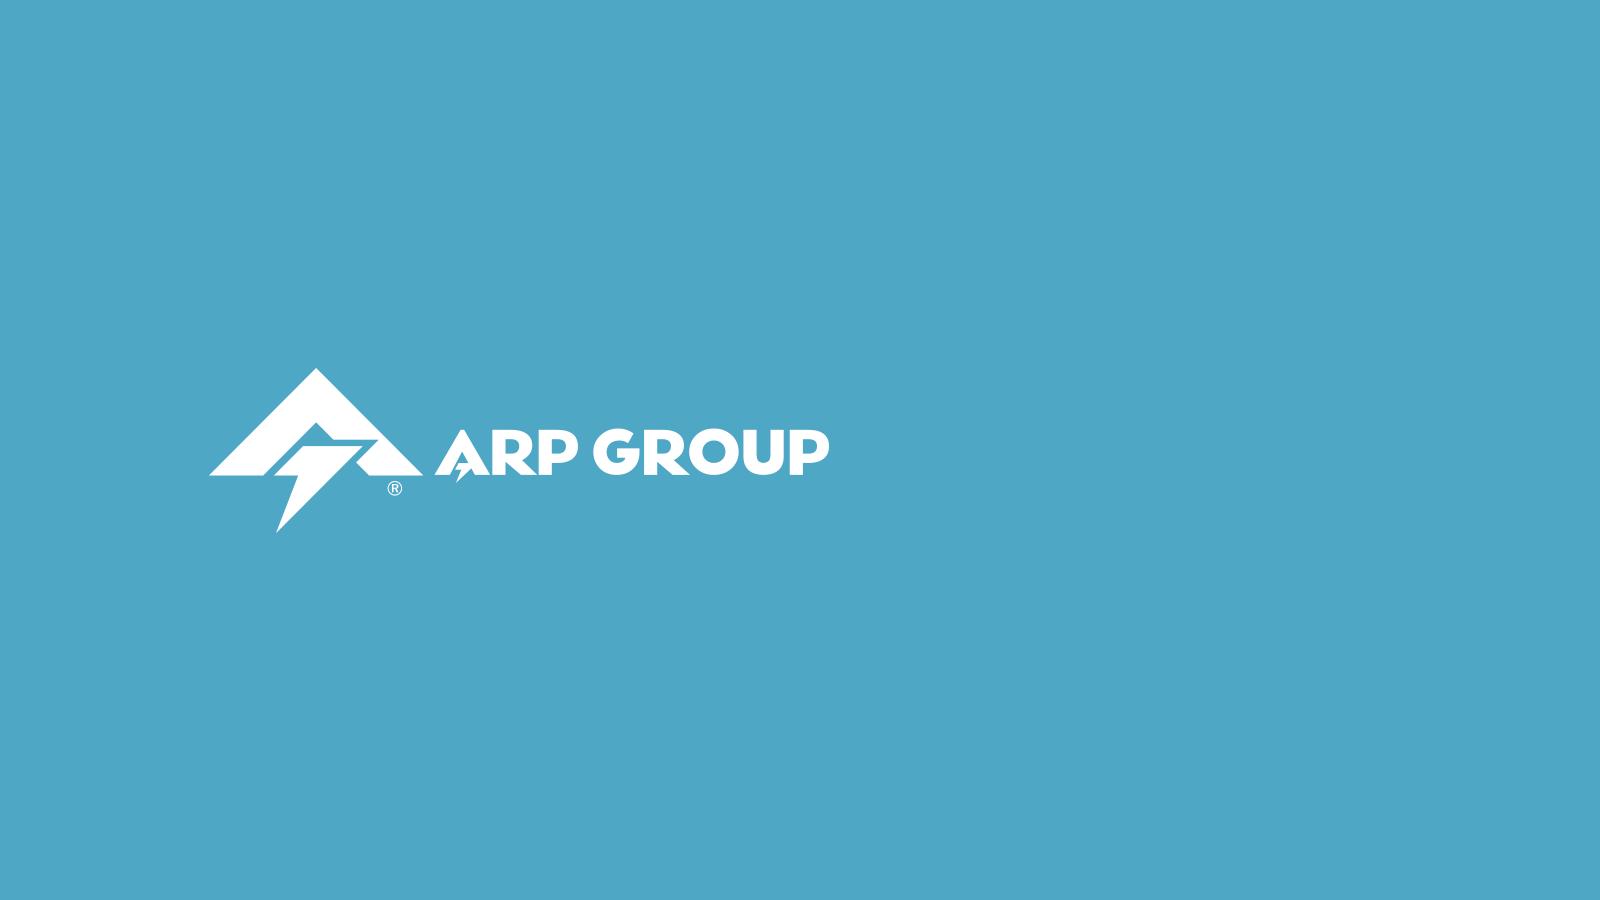 graphic-brand-design-web-designer-hiline-lahore-pakistan-arp-group-banner